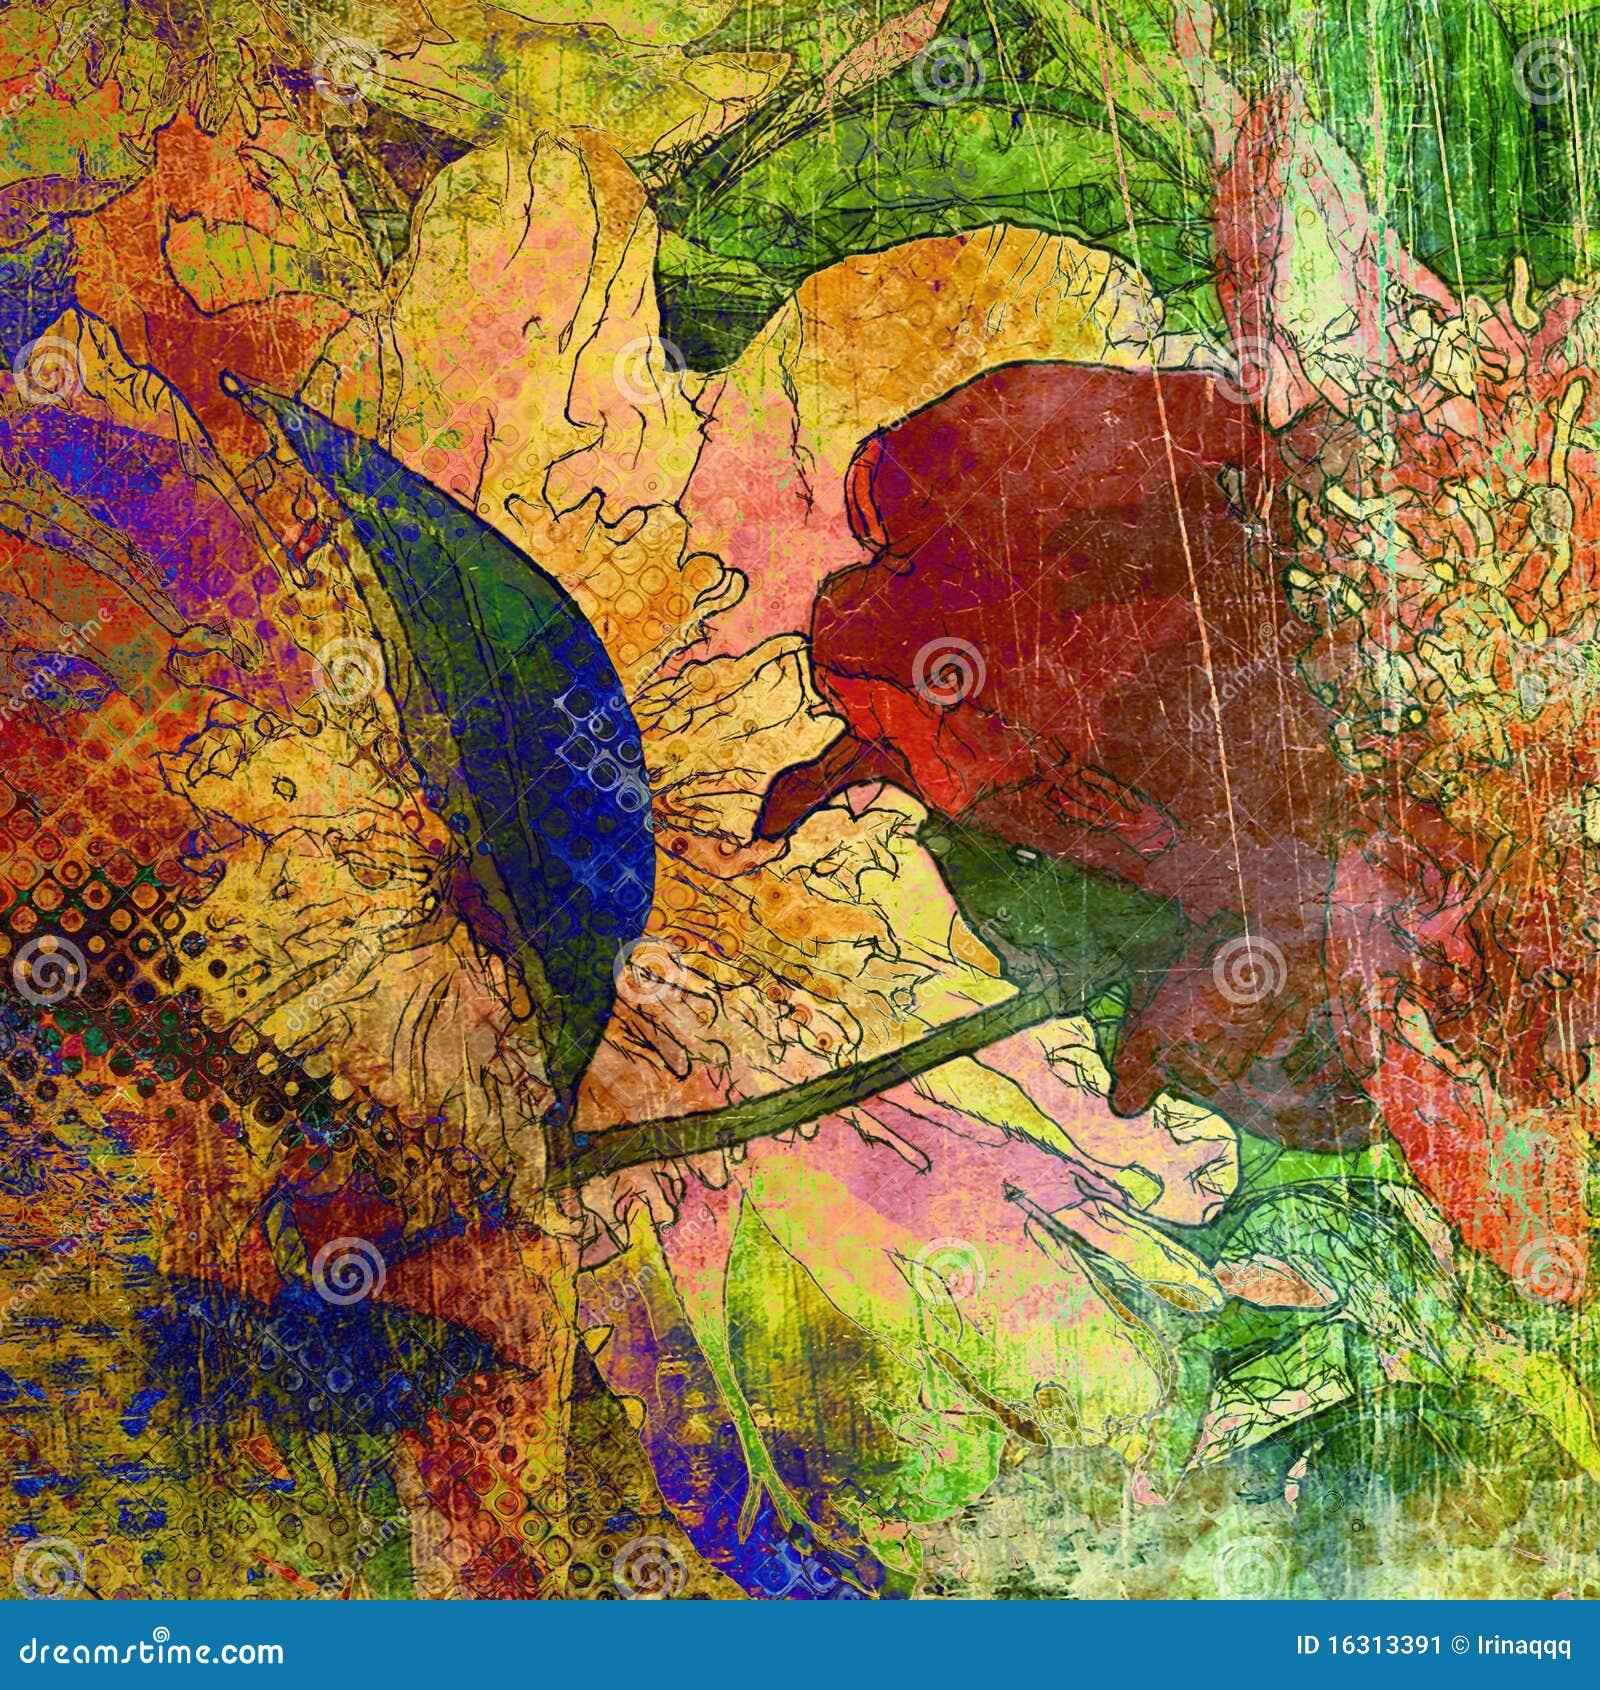 Download Art Floral Grunge Graphic Background Stock Illustration - Illustration of illustration, aging: 16313391